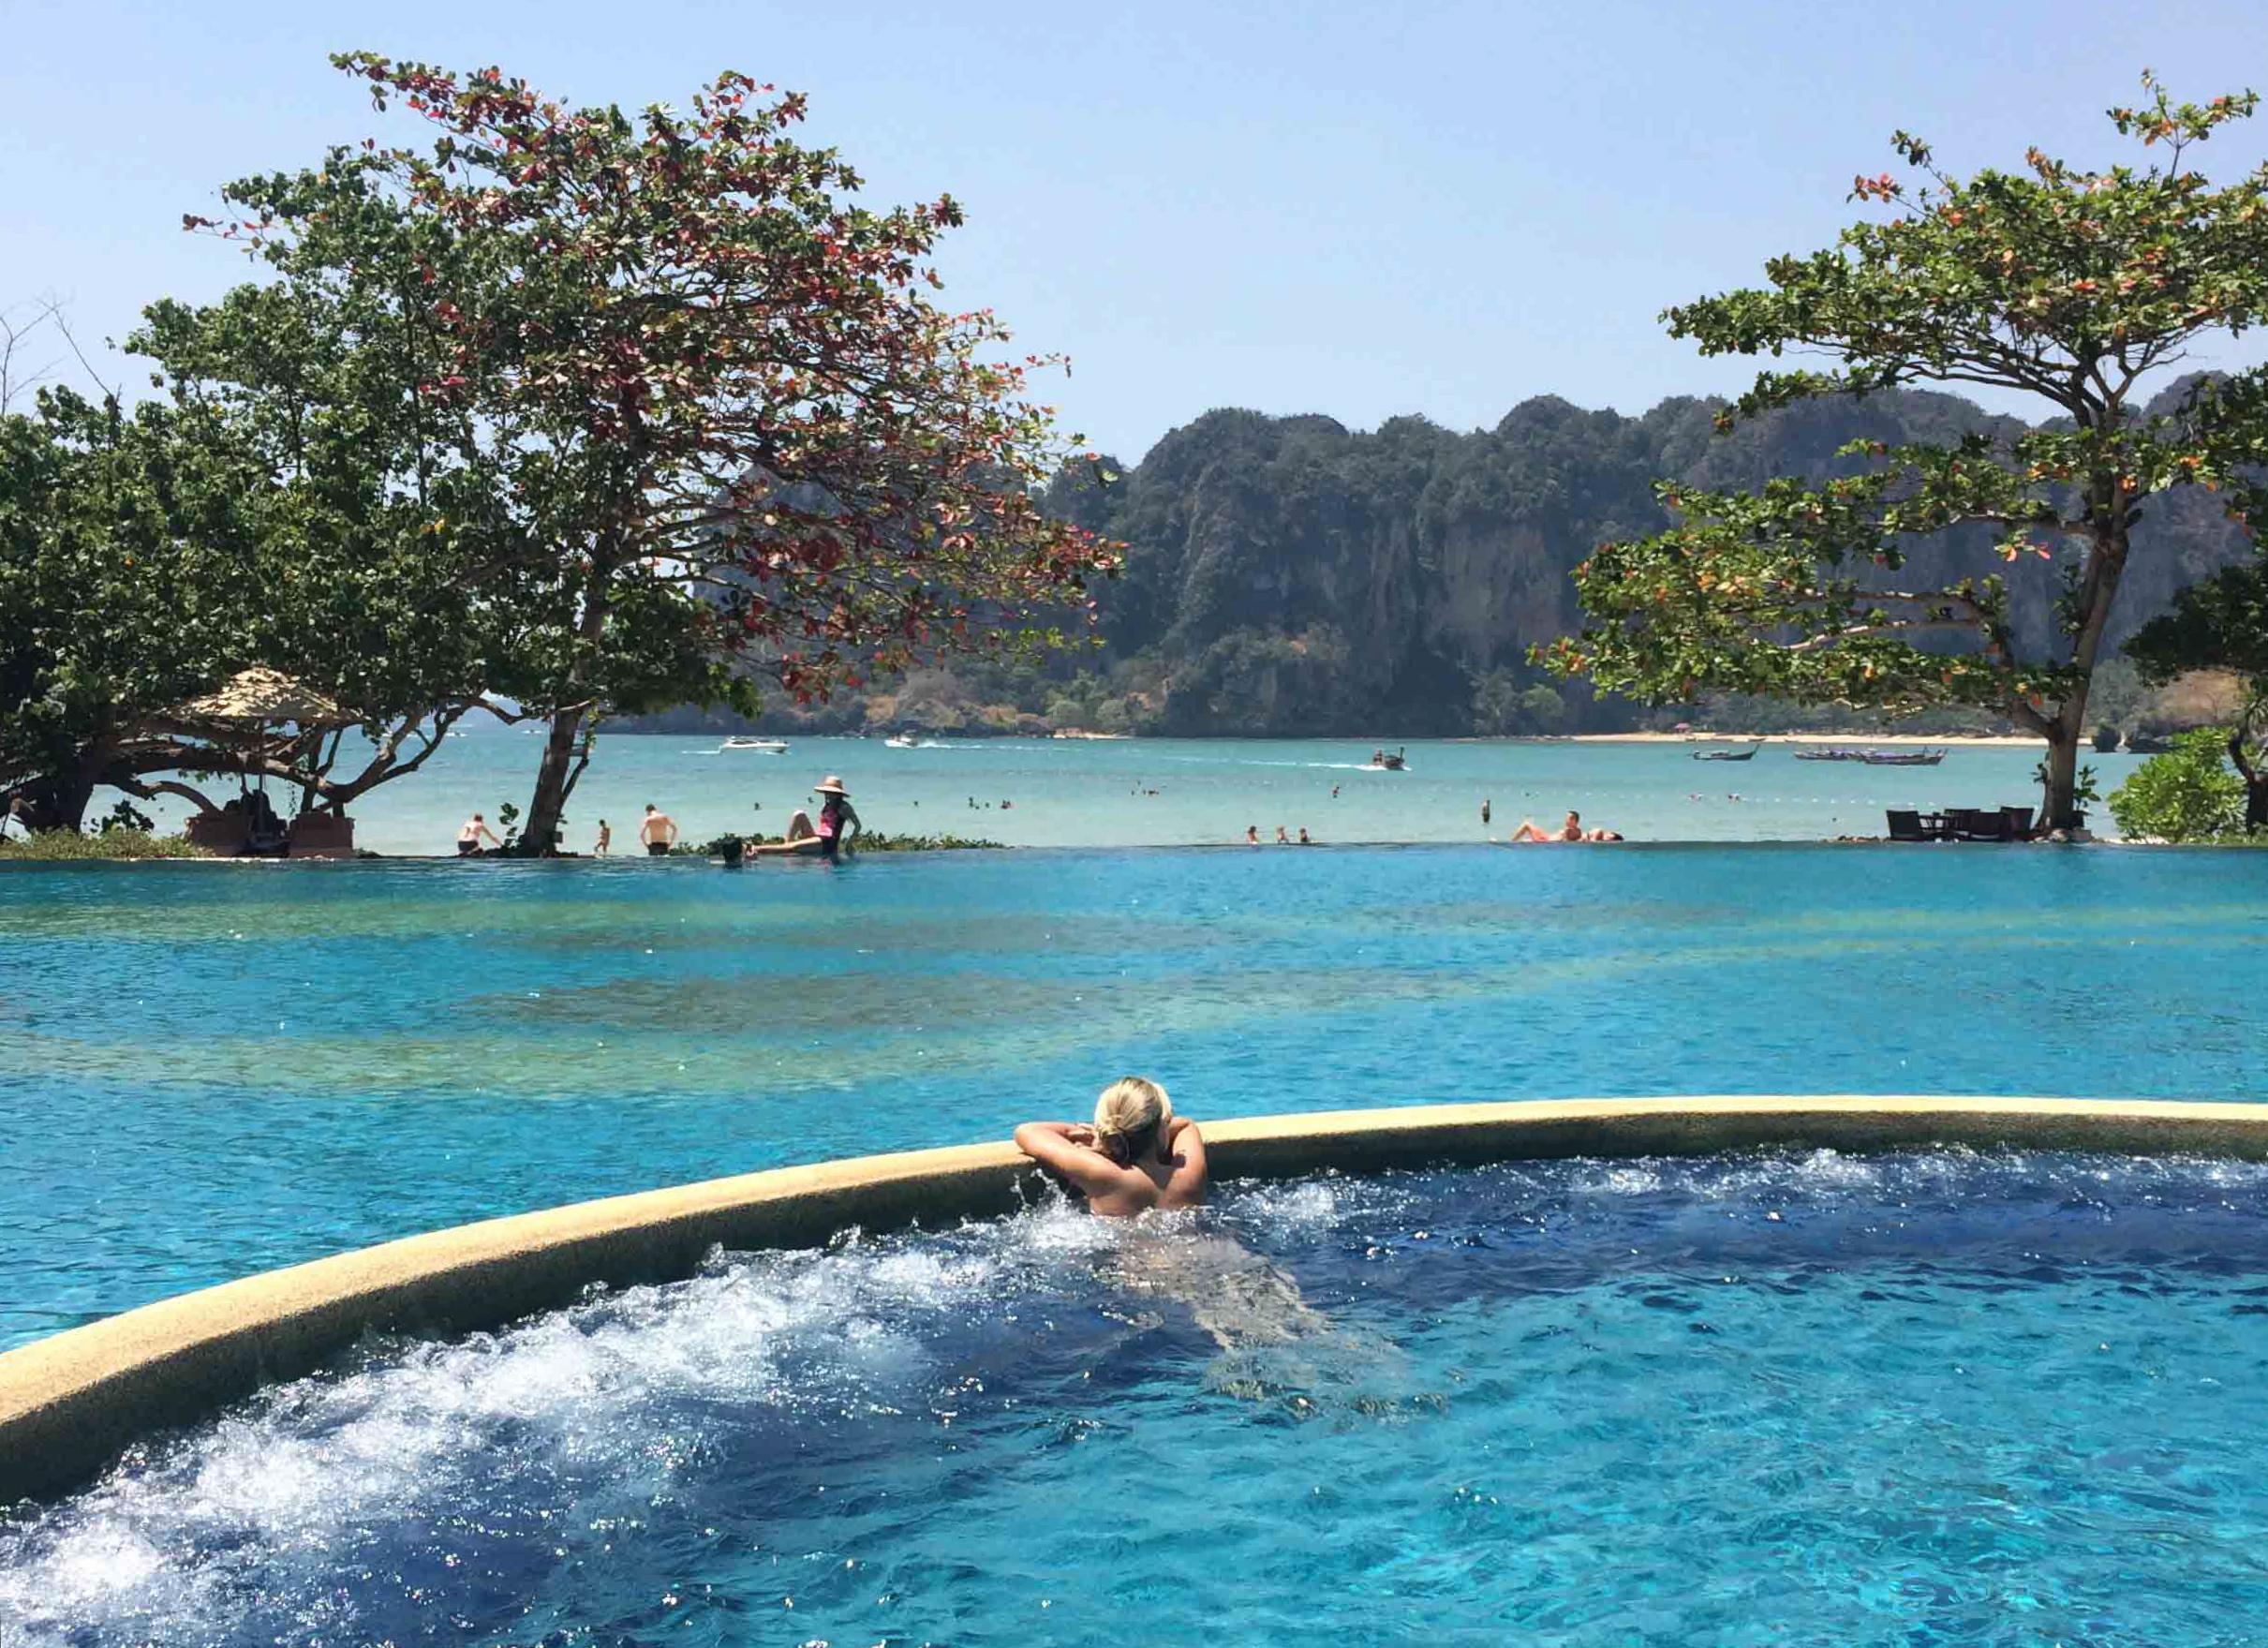 lua de mel mes a mes - Rayavadee Resort - Krabi - Railay Beach - Tailandia